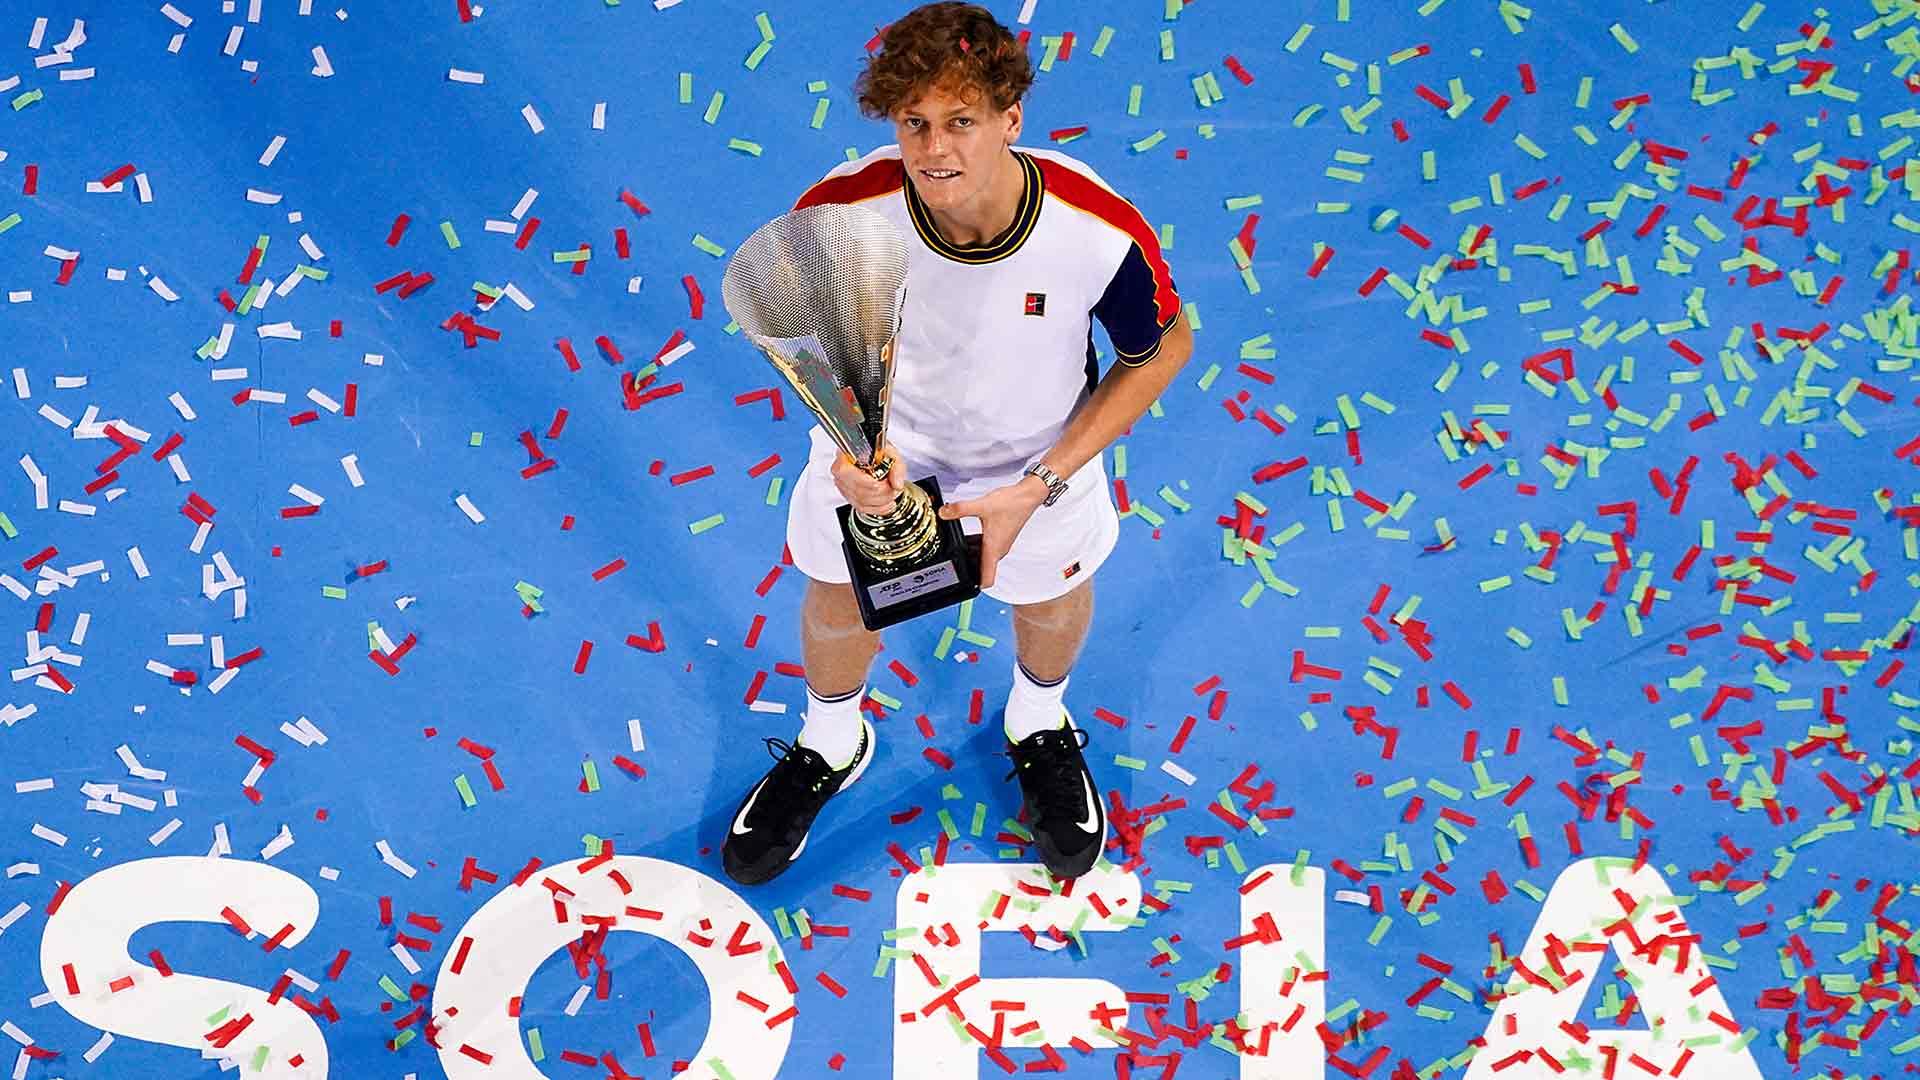 sinner sofia final 2021 sunday trophy - ATP Sofia: Sinner ugnal Monfilsa za četrto lovoriko